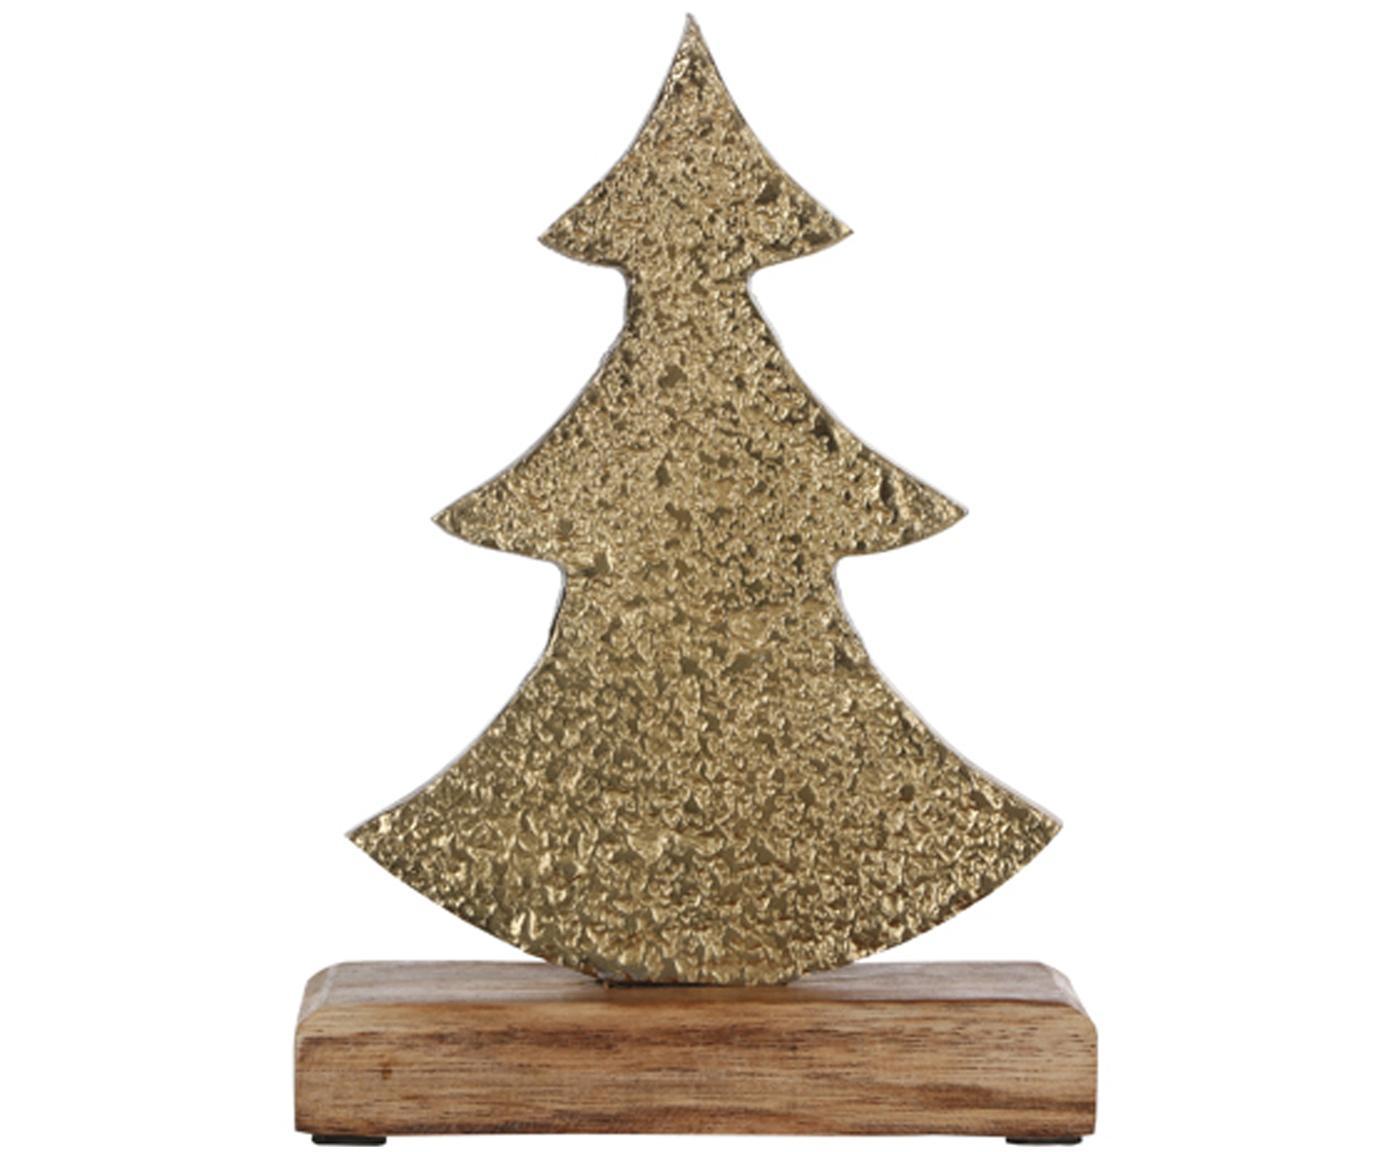 Decoratief object Christmas Tree, Voetstuk: hout, Messingkleurig, 13 x 21 cm